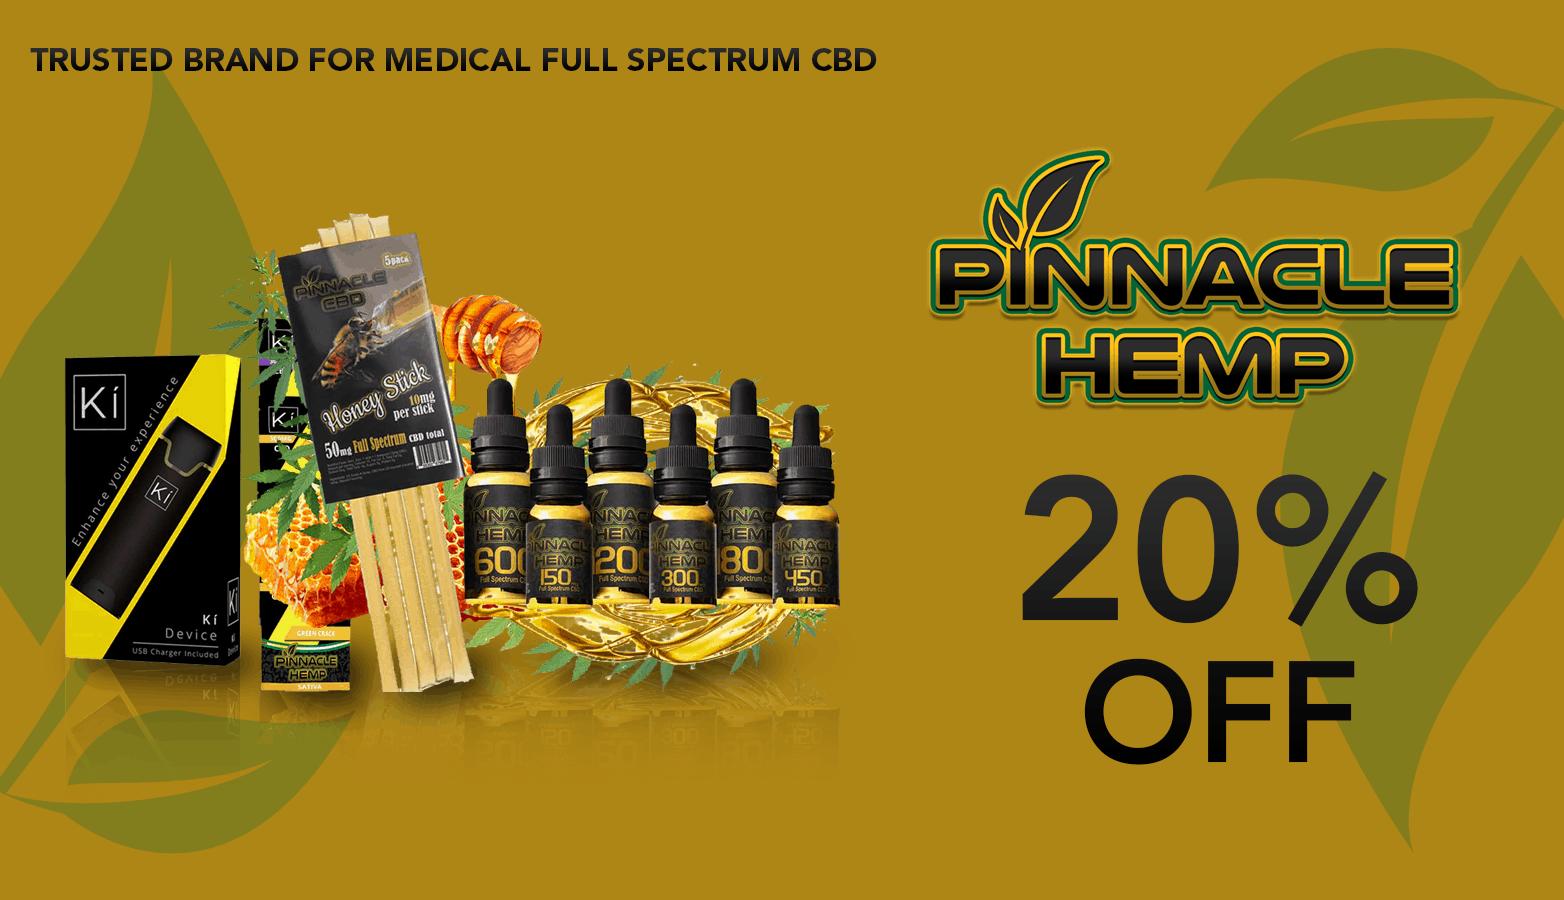 Pinnacle Hemp CBD Coupon Code discounts promos save on cannabis online Website